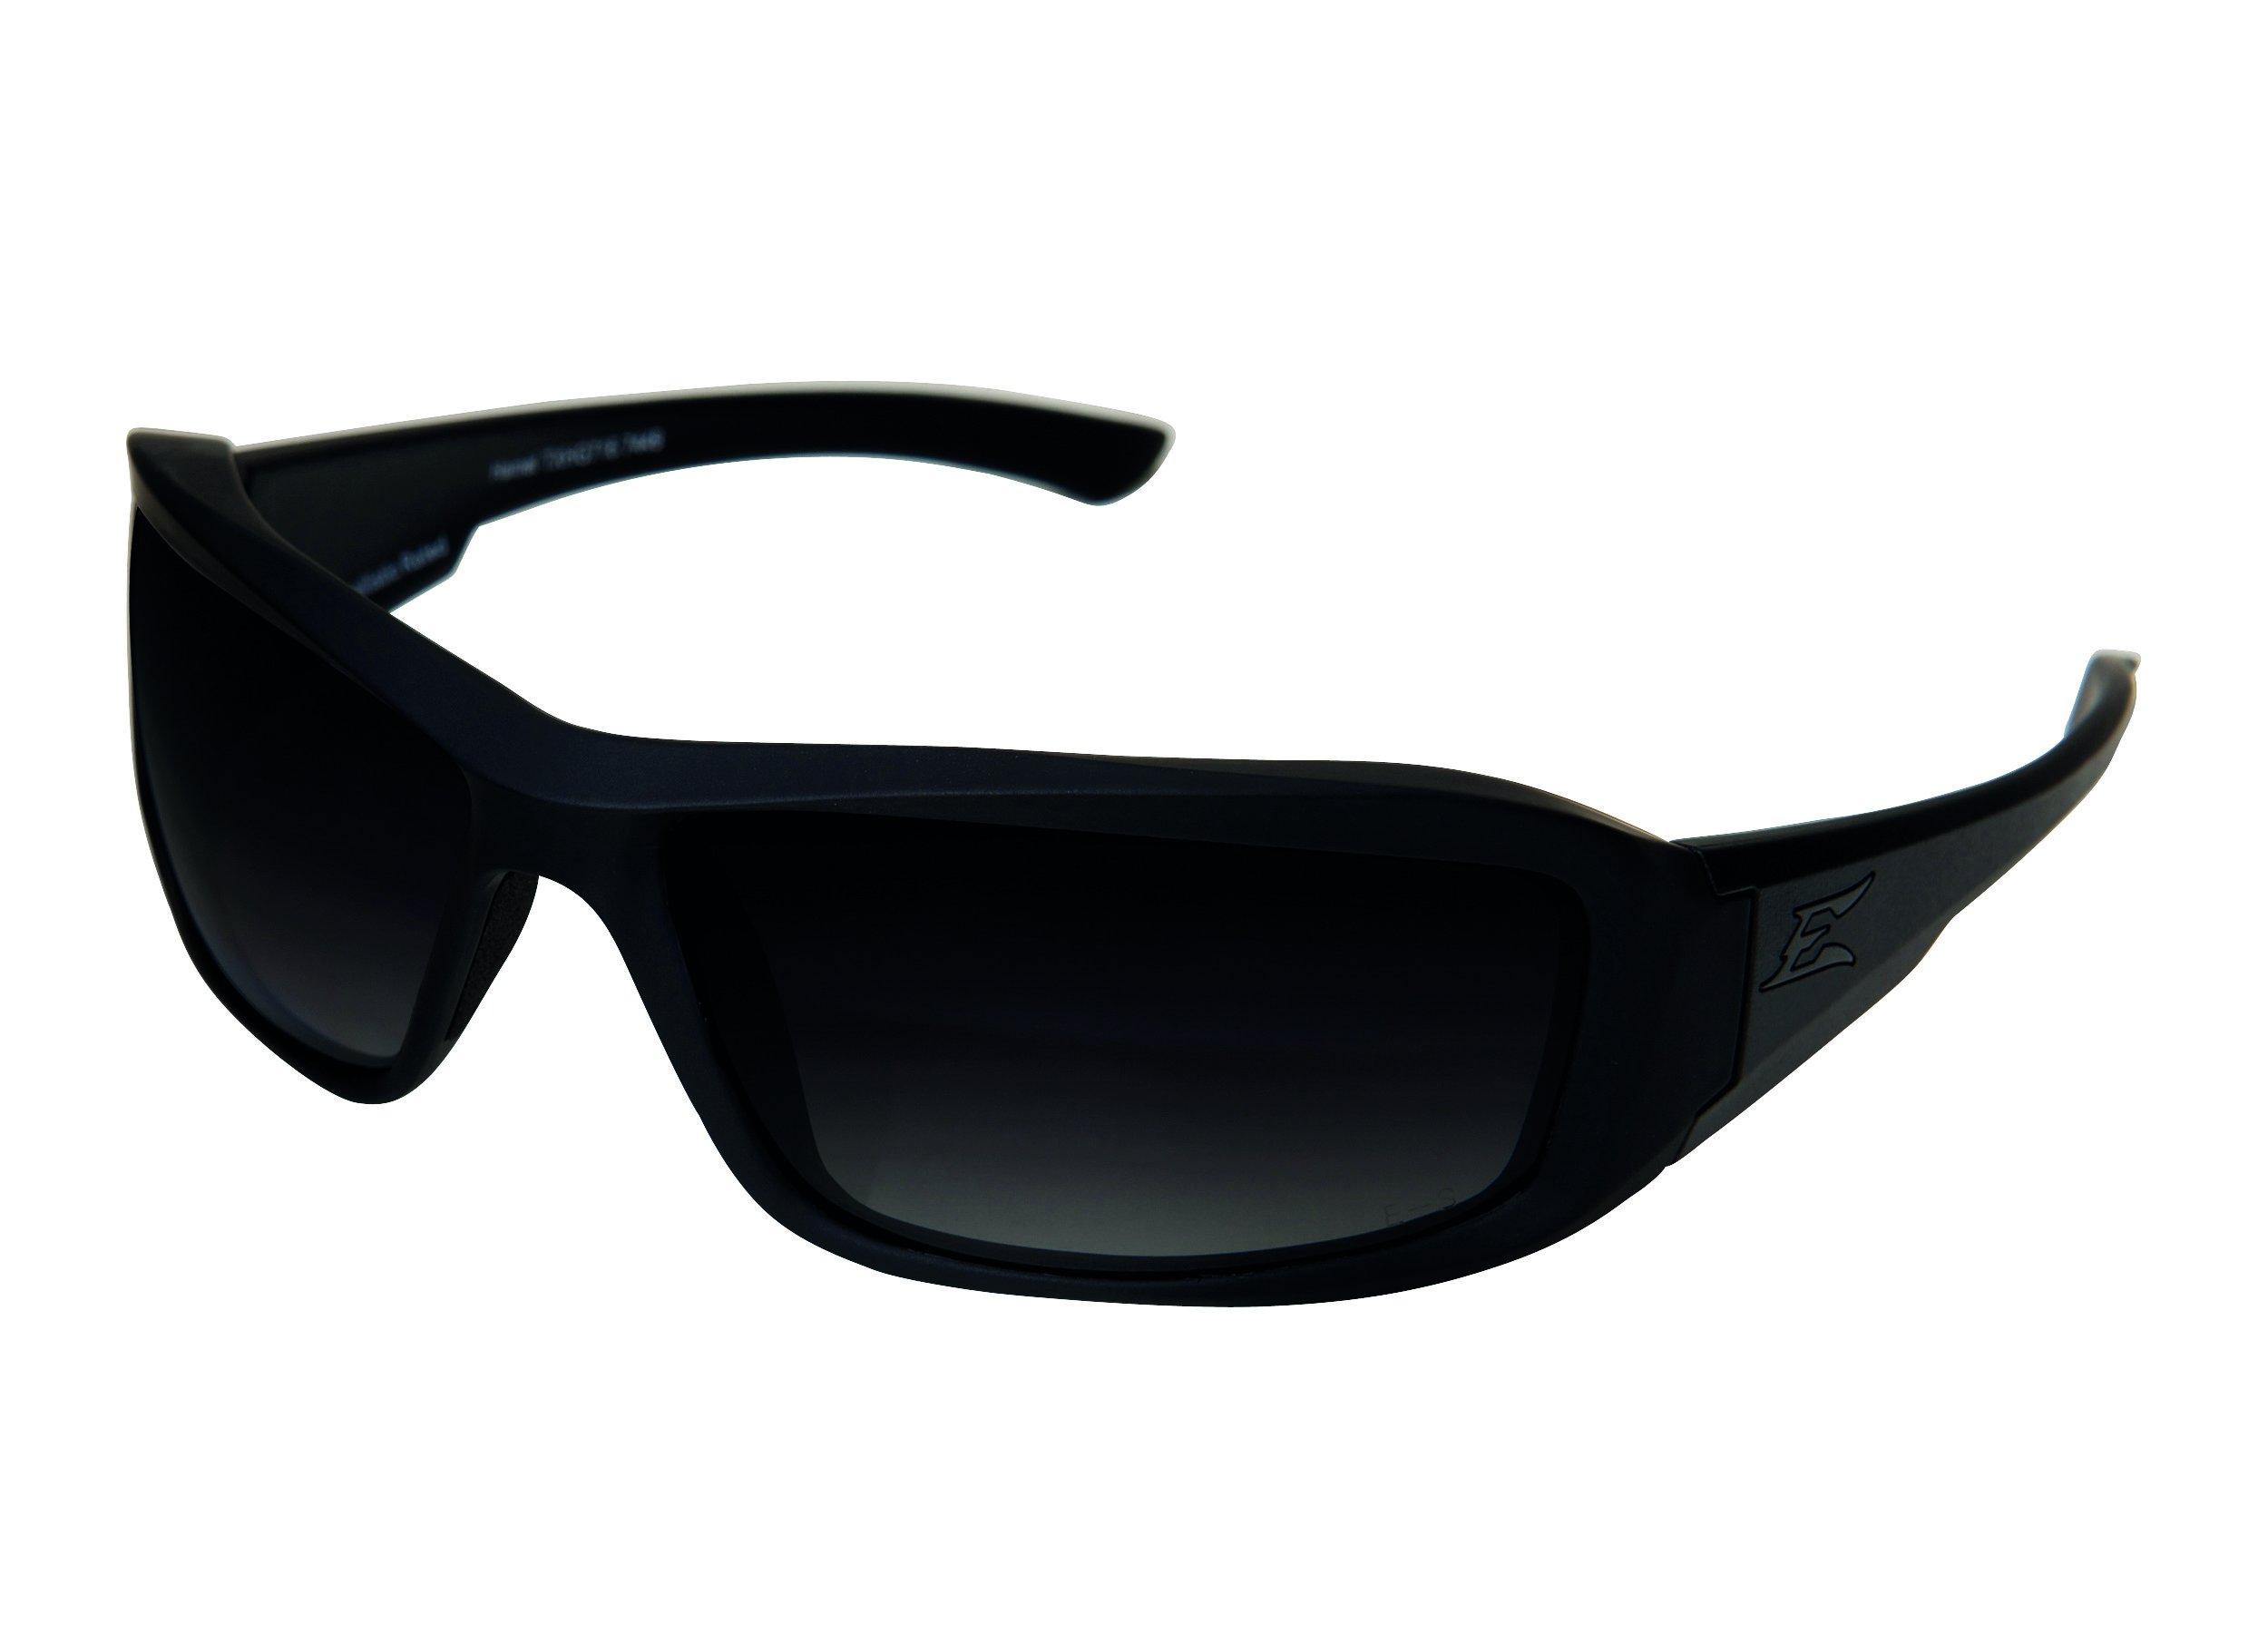 Edge Tactical Eyewear TXHG716 Hamel Matte Black with Polarized Gradient Smoke Lens by Edge Eyewear